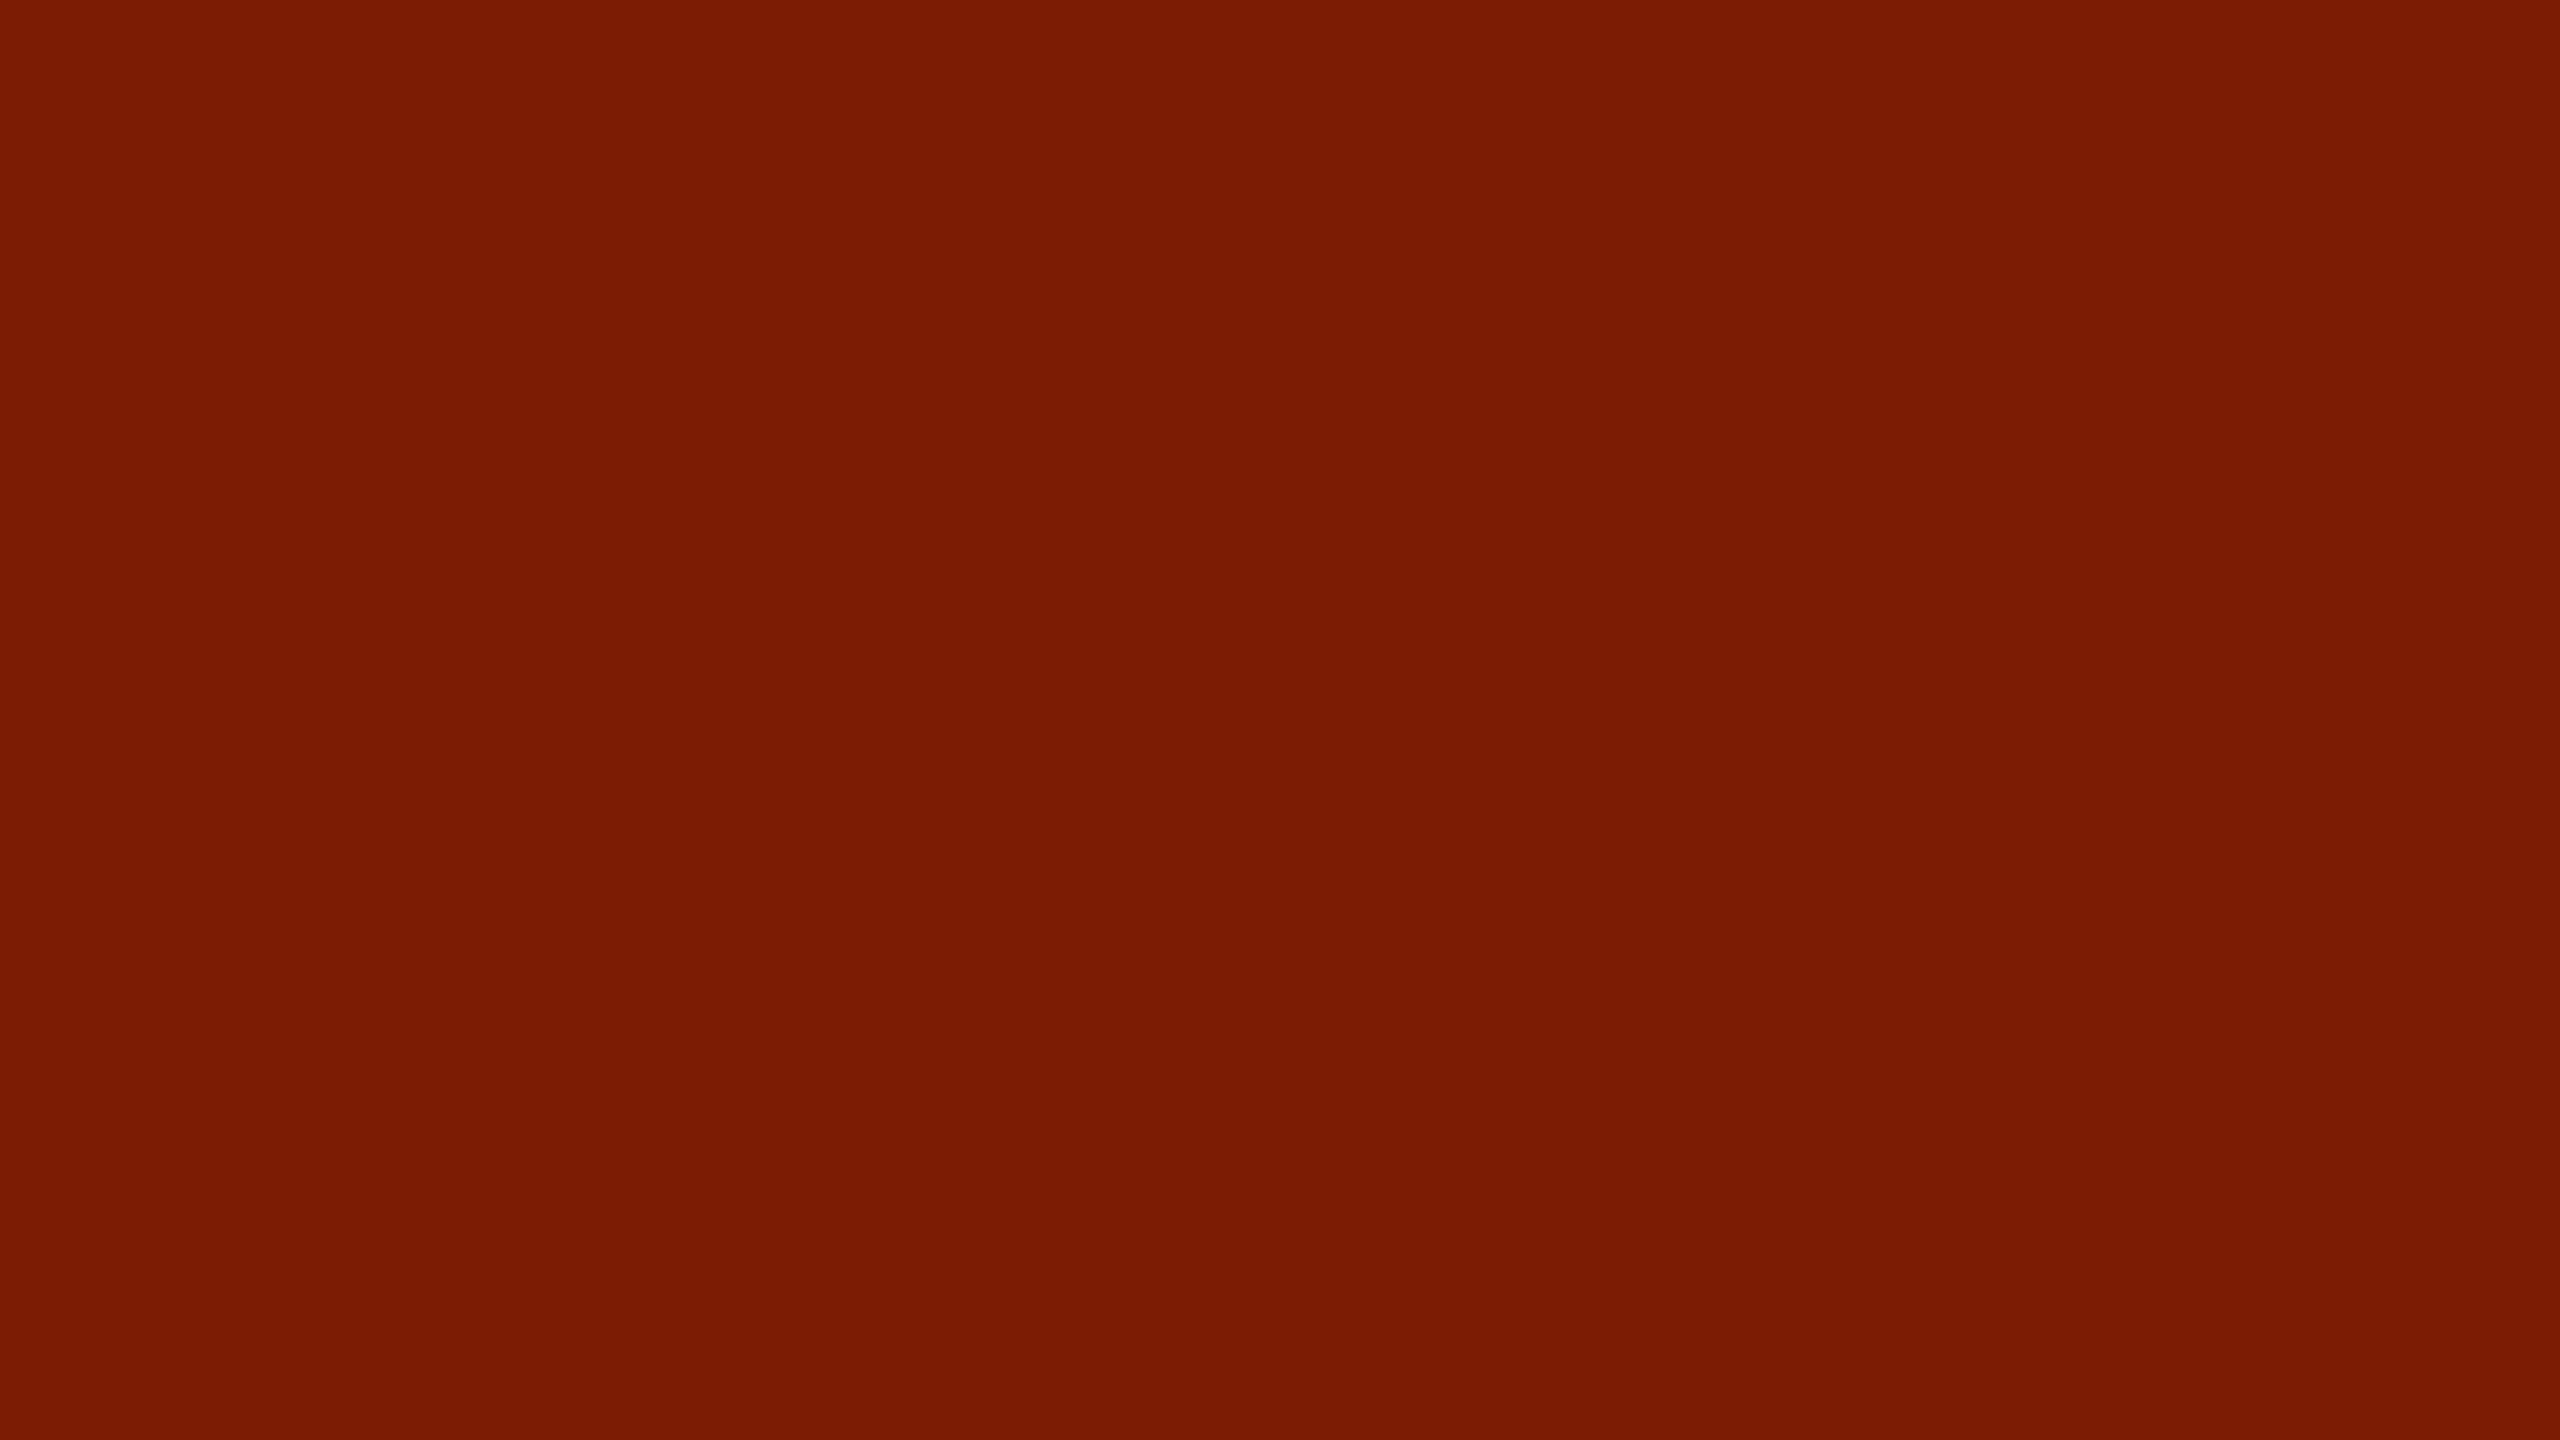 2560x1440 Kenyan Copper Solid Color Background